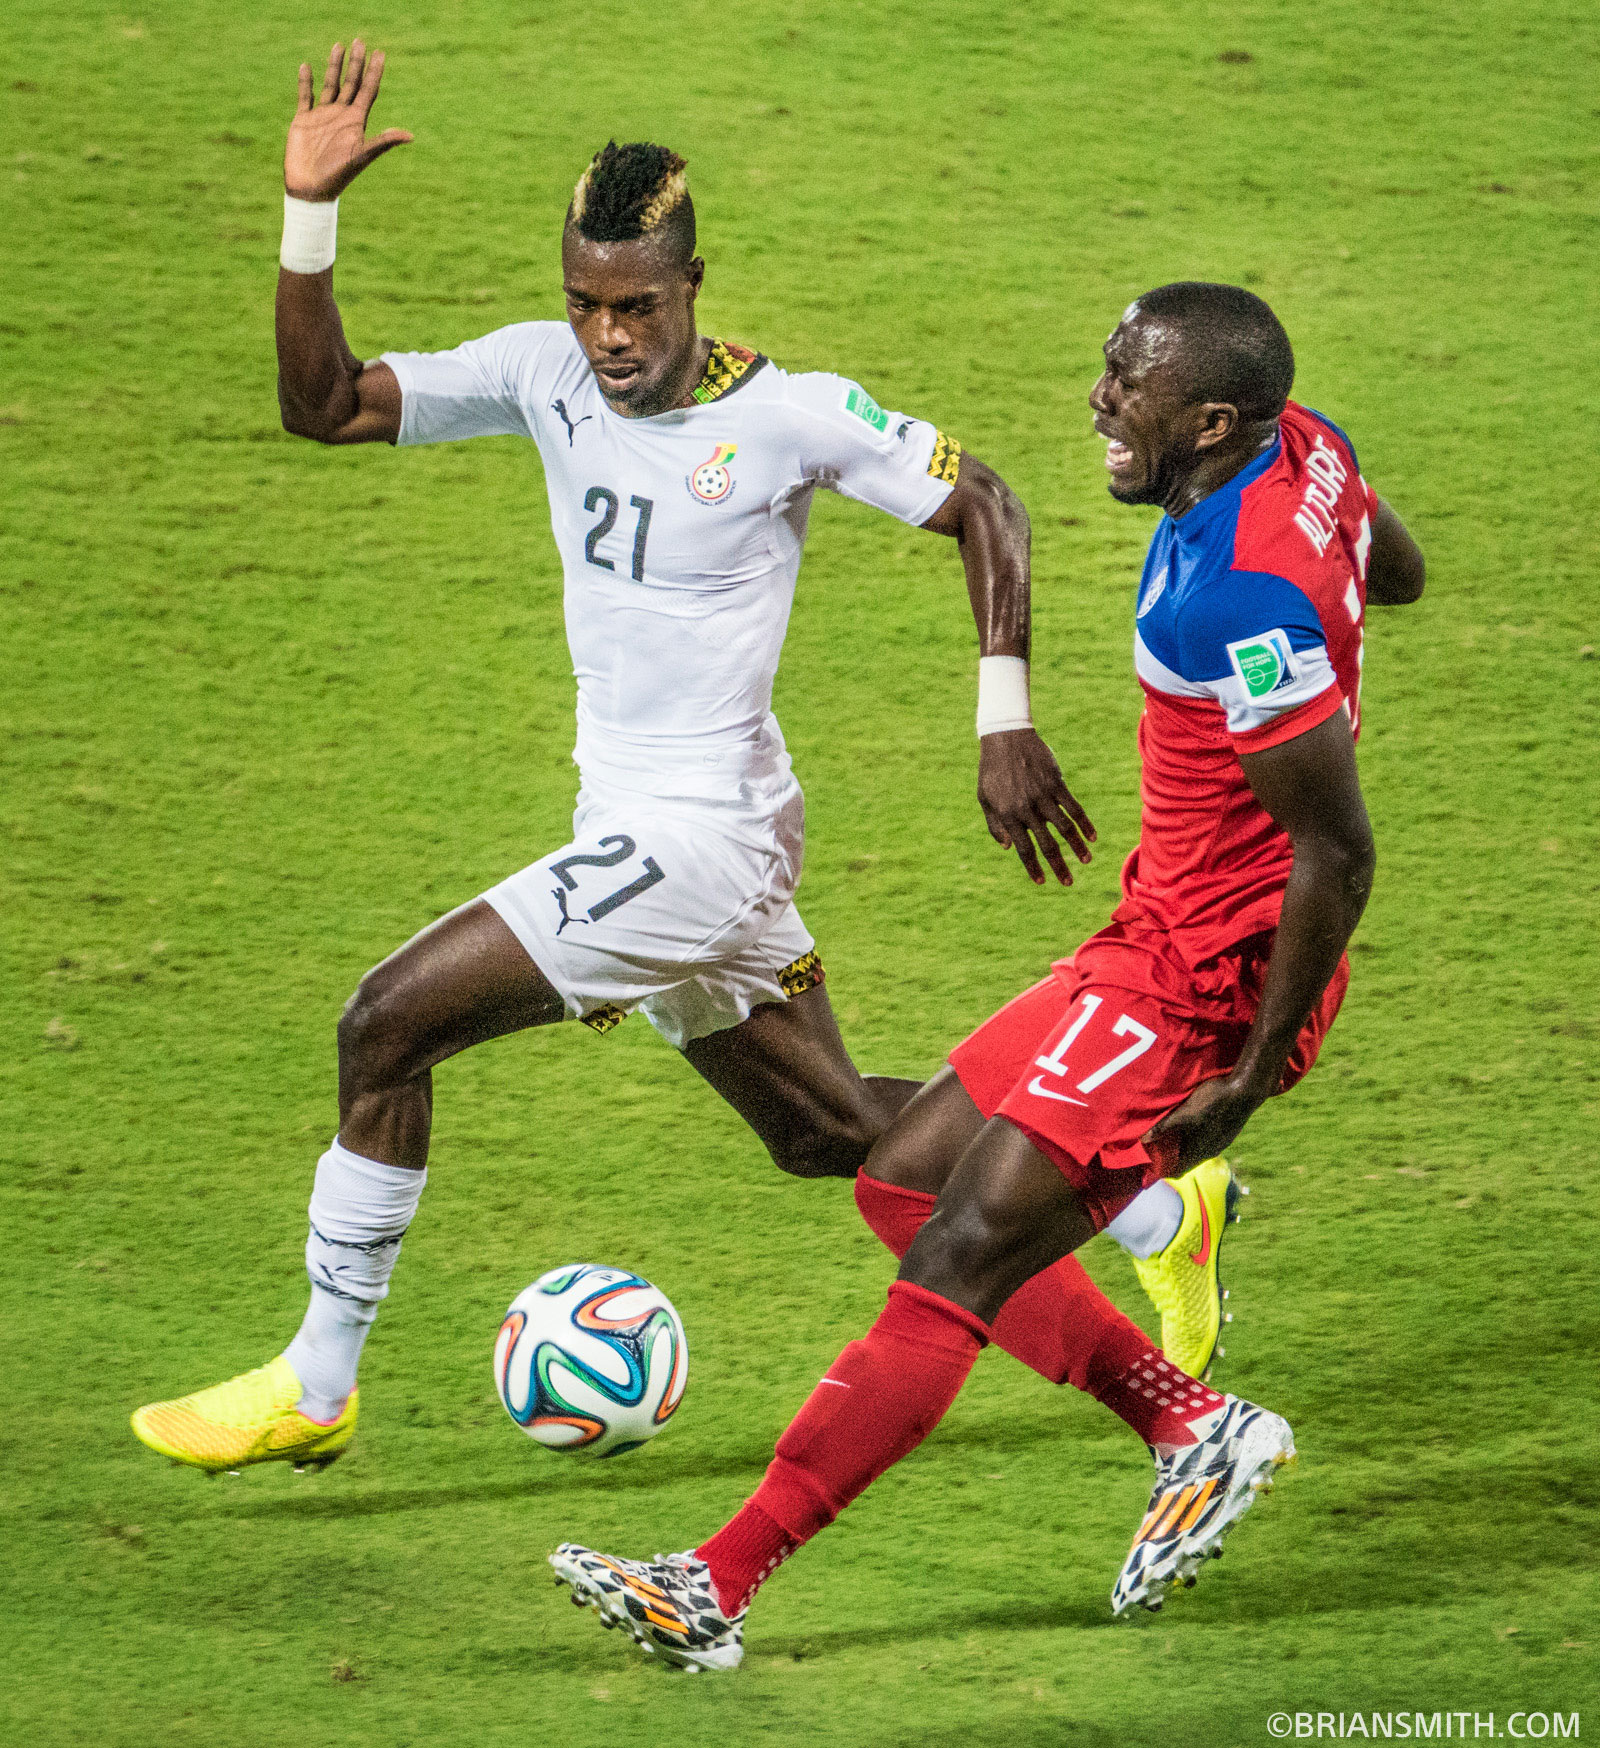 Jozy Altidore pulls a hamstring in USA-Ghana Match in Natal, Brazil shot on Sony a77 II